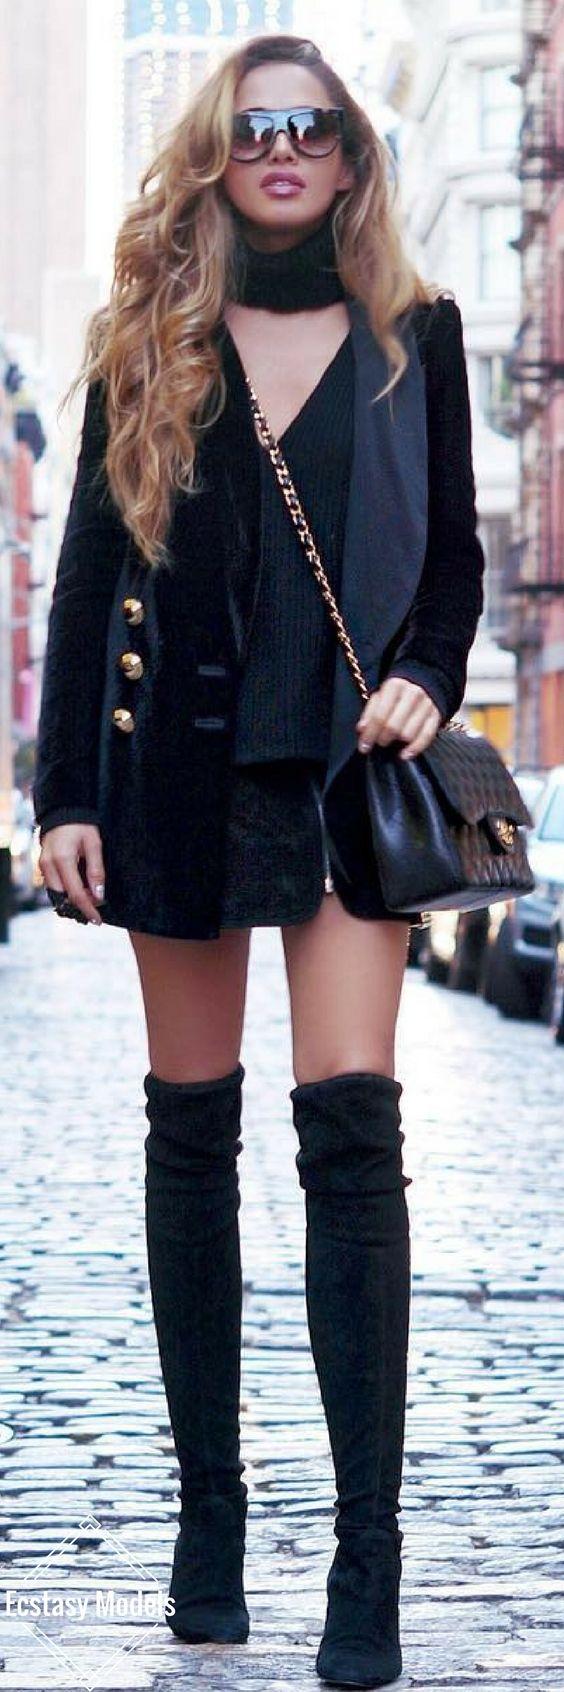 Streets Of SoHo // Blazer by InFashion // Fashion Look by Amra Beganovich